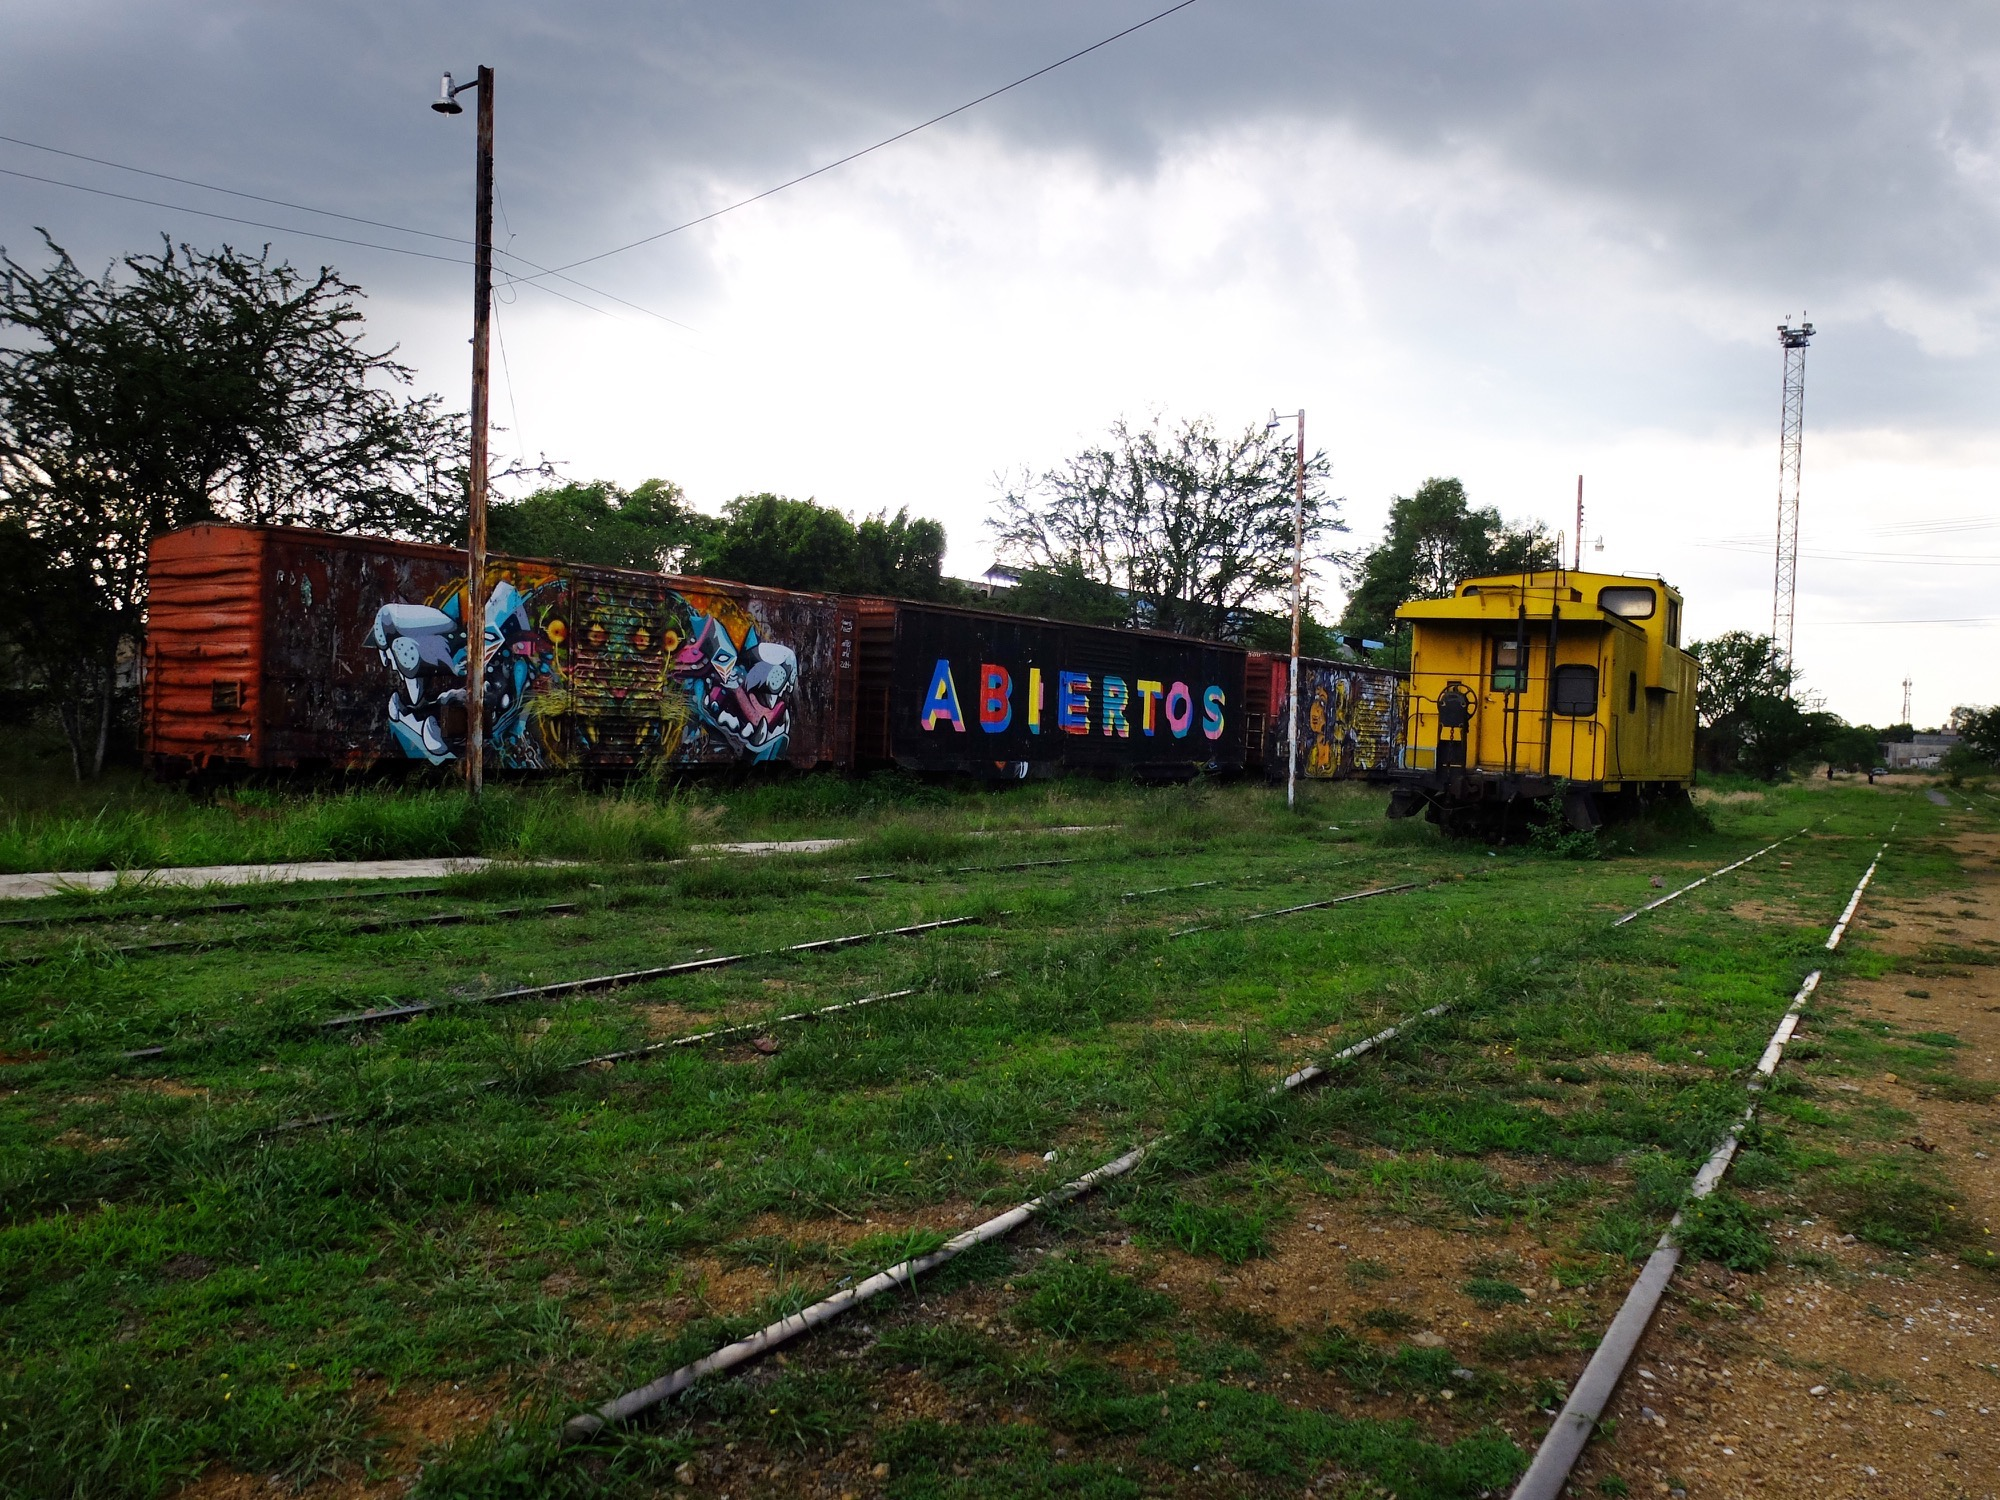 Museo del Ferrocarril (railroad museum).